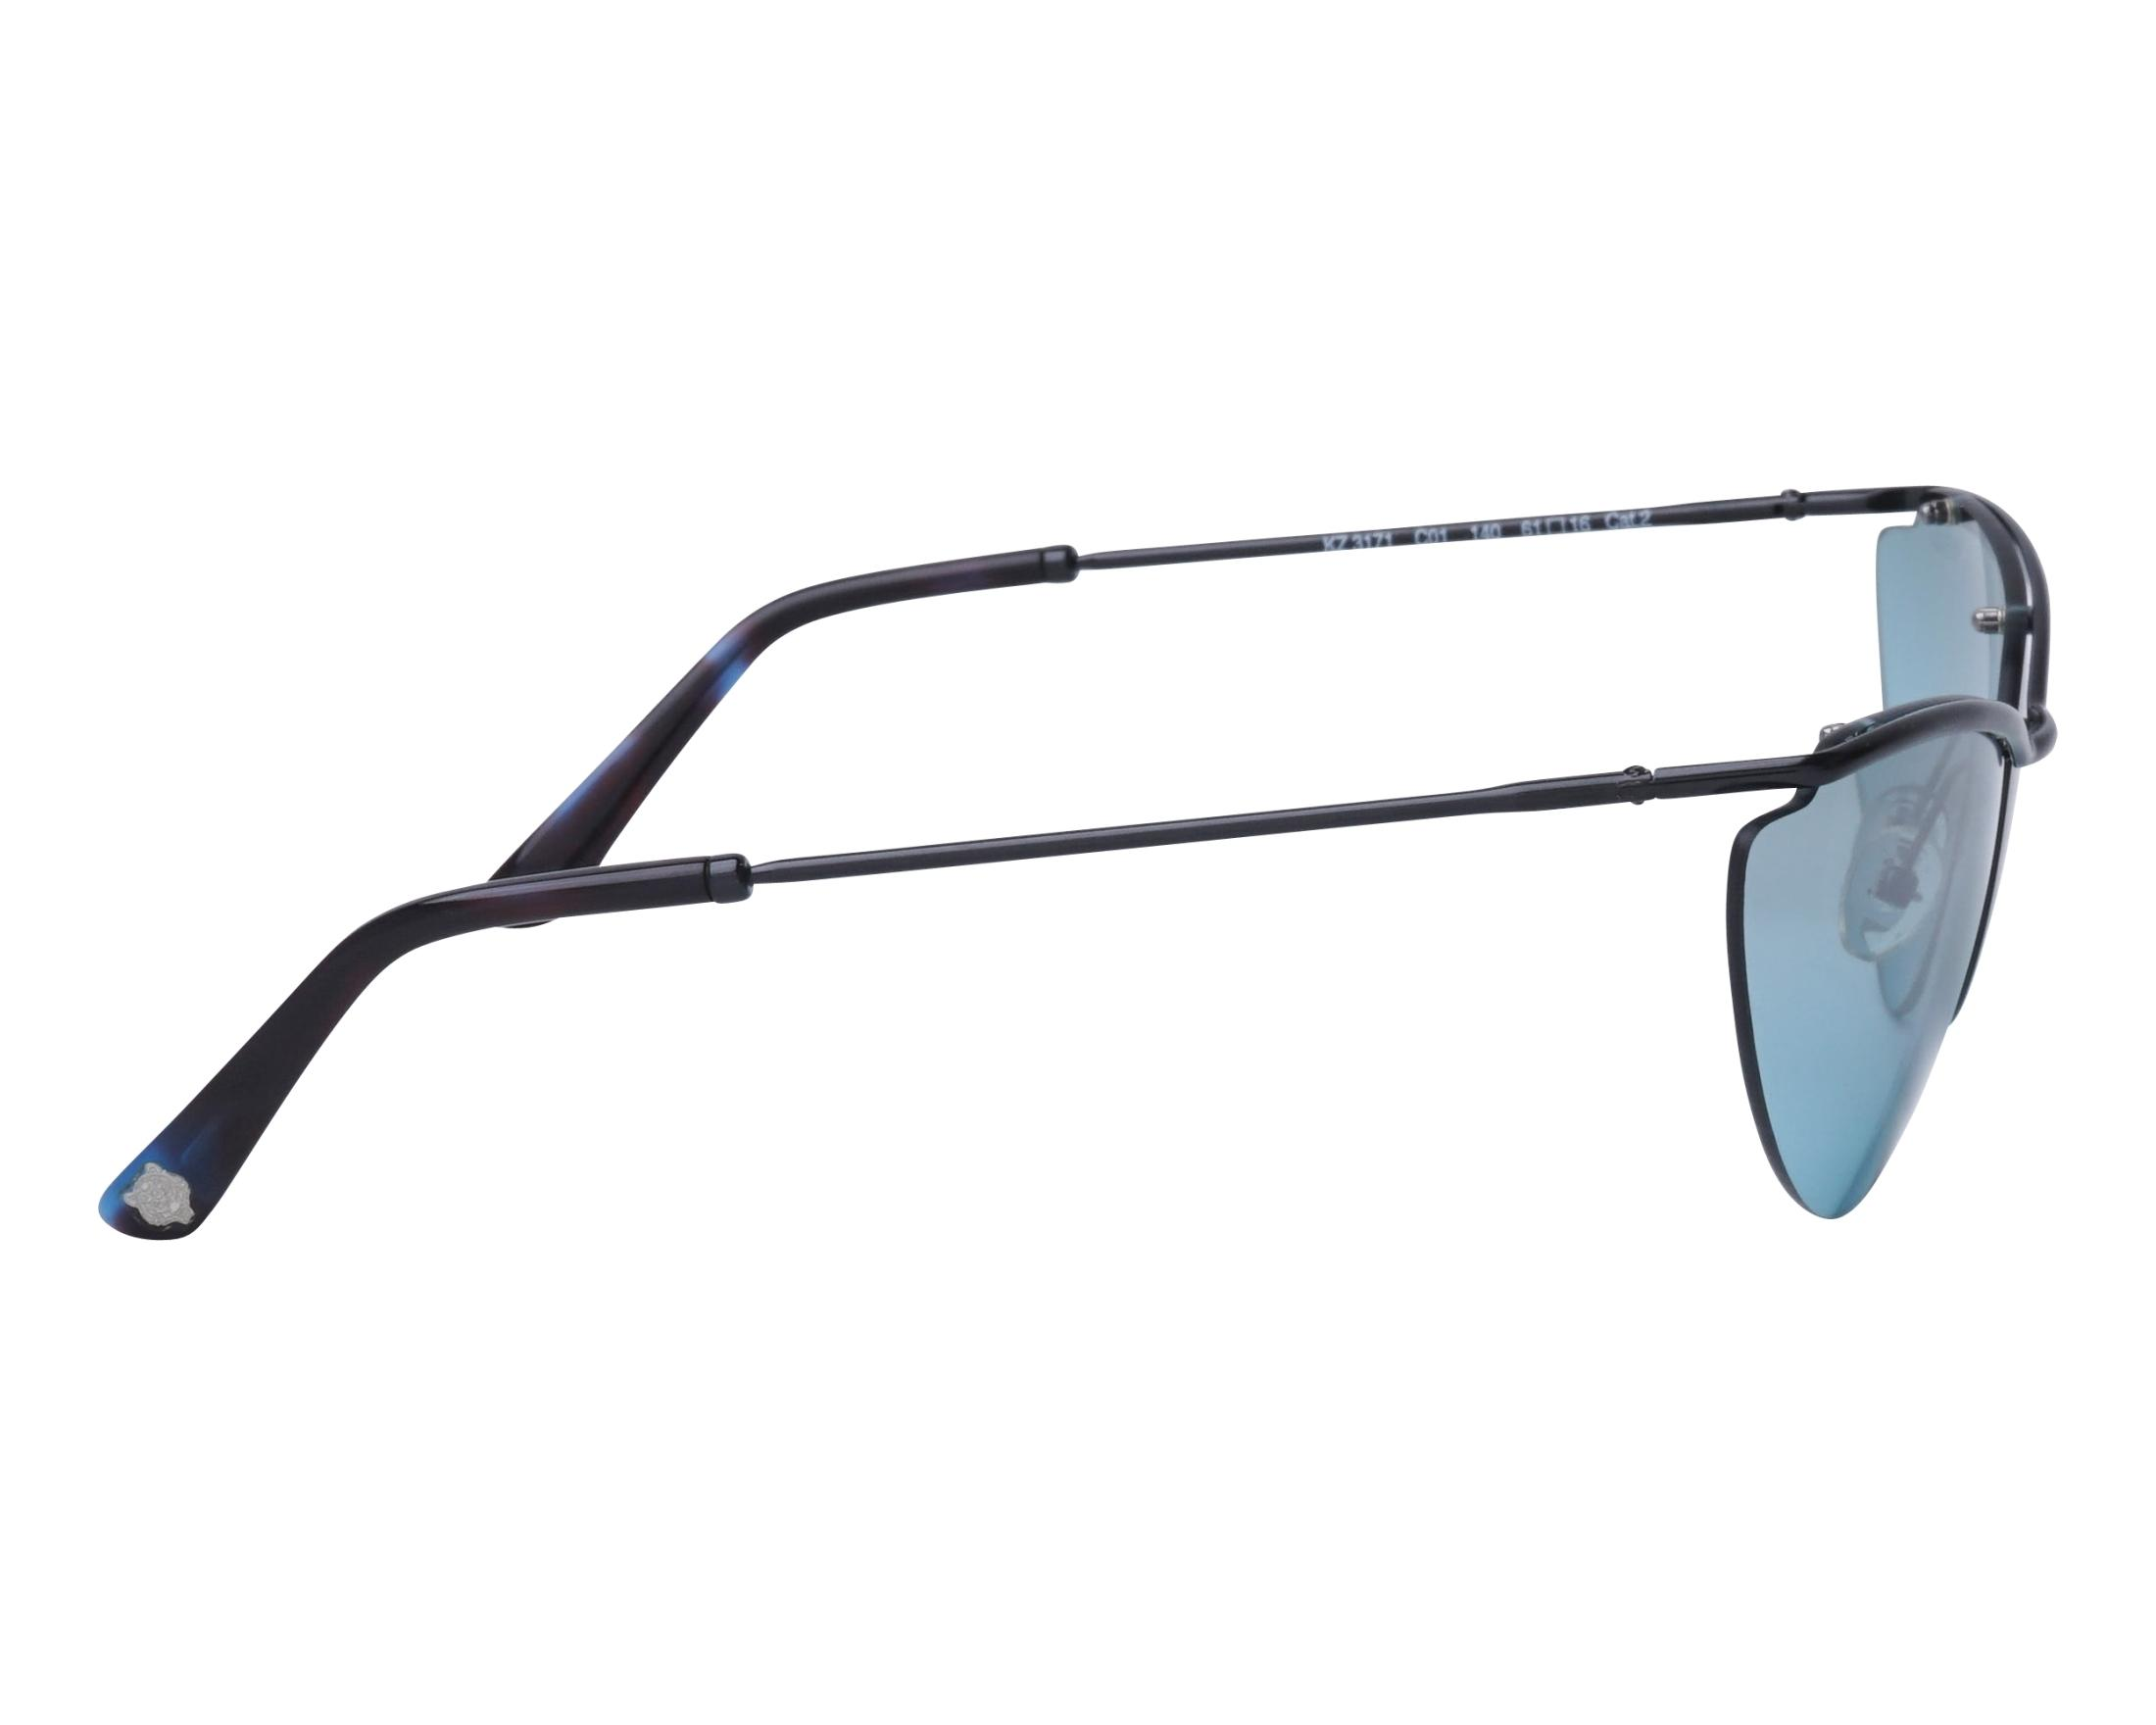 2d5374b0bc3 Sunglasses Kenzo KZ-3171 C01 61-16 Black side view